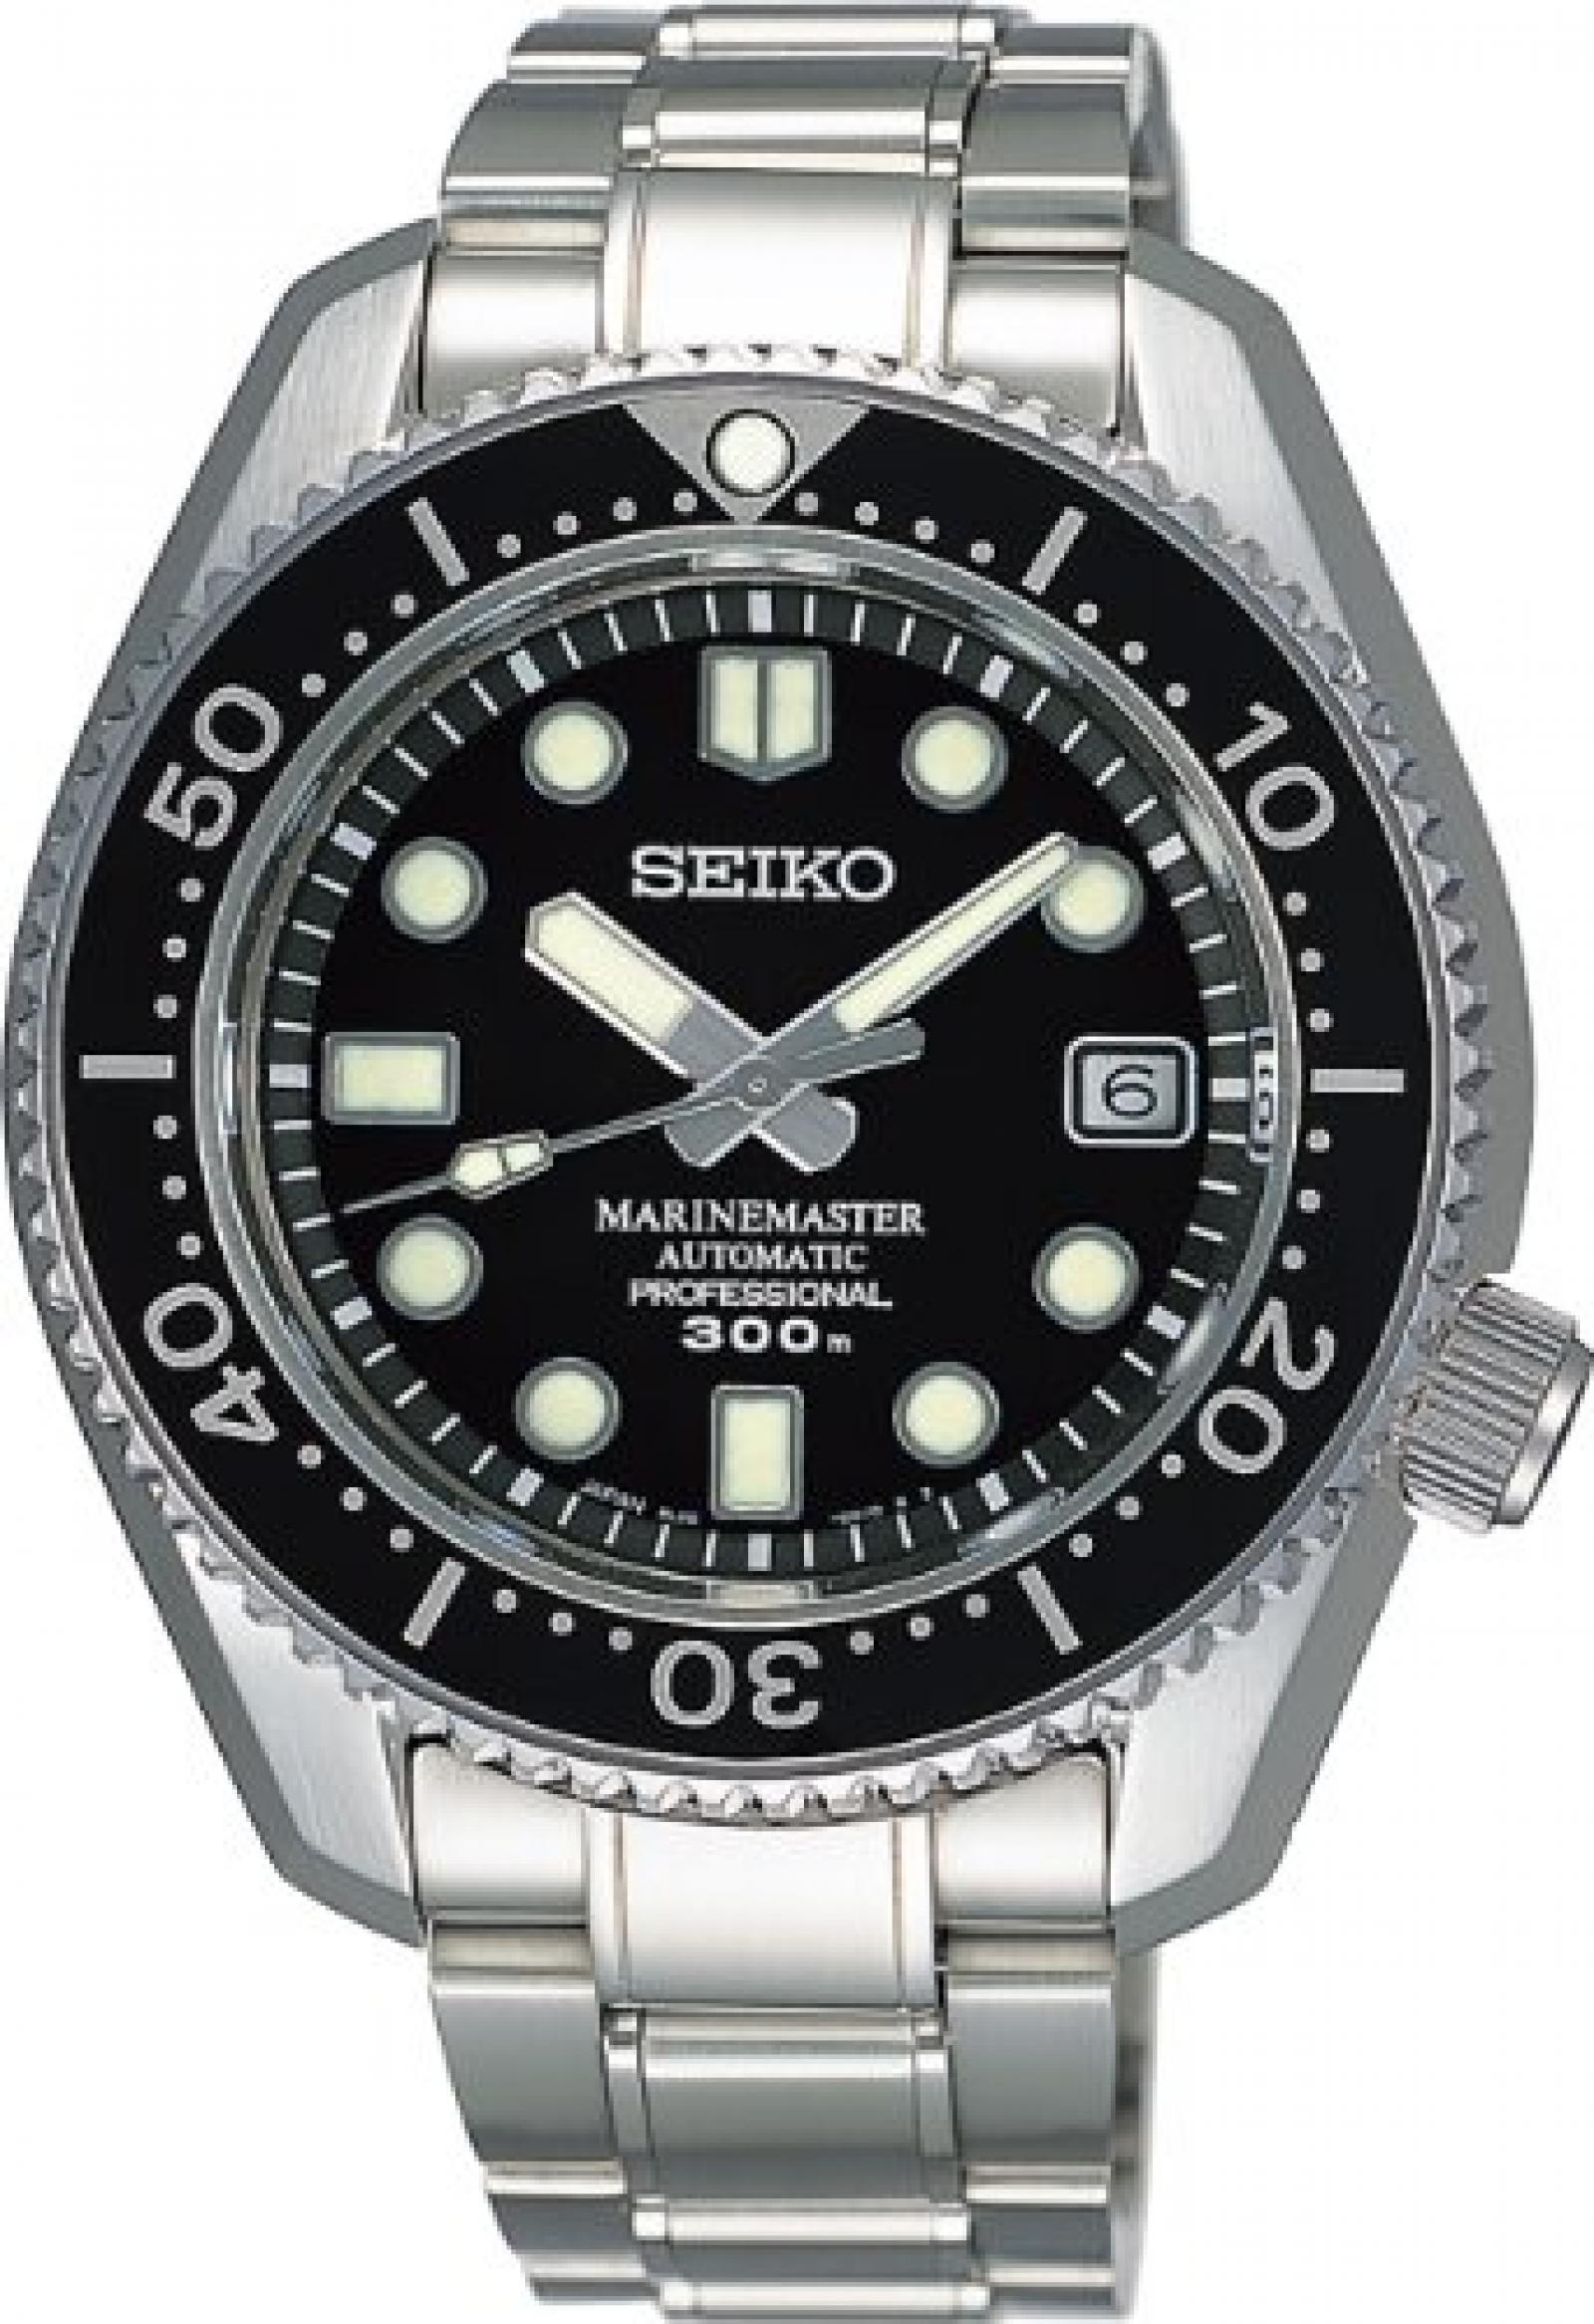 Seiko Uhr SBDX001 PROSPEX Marine Master Professionel automatic mens watch